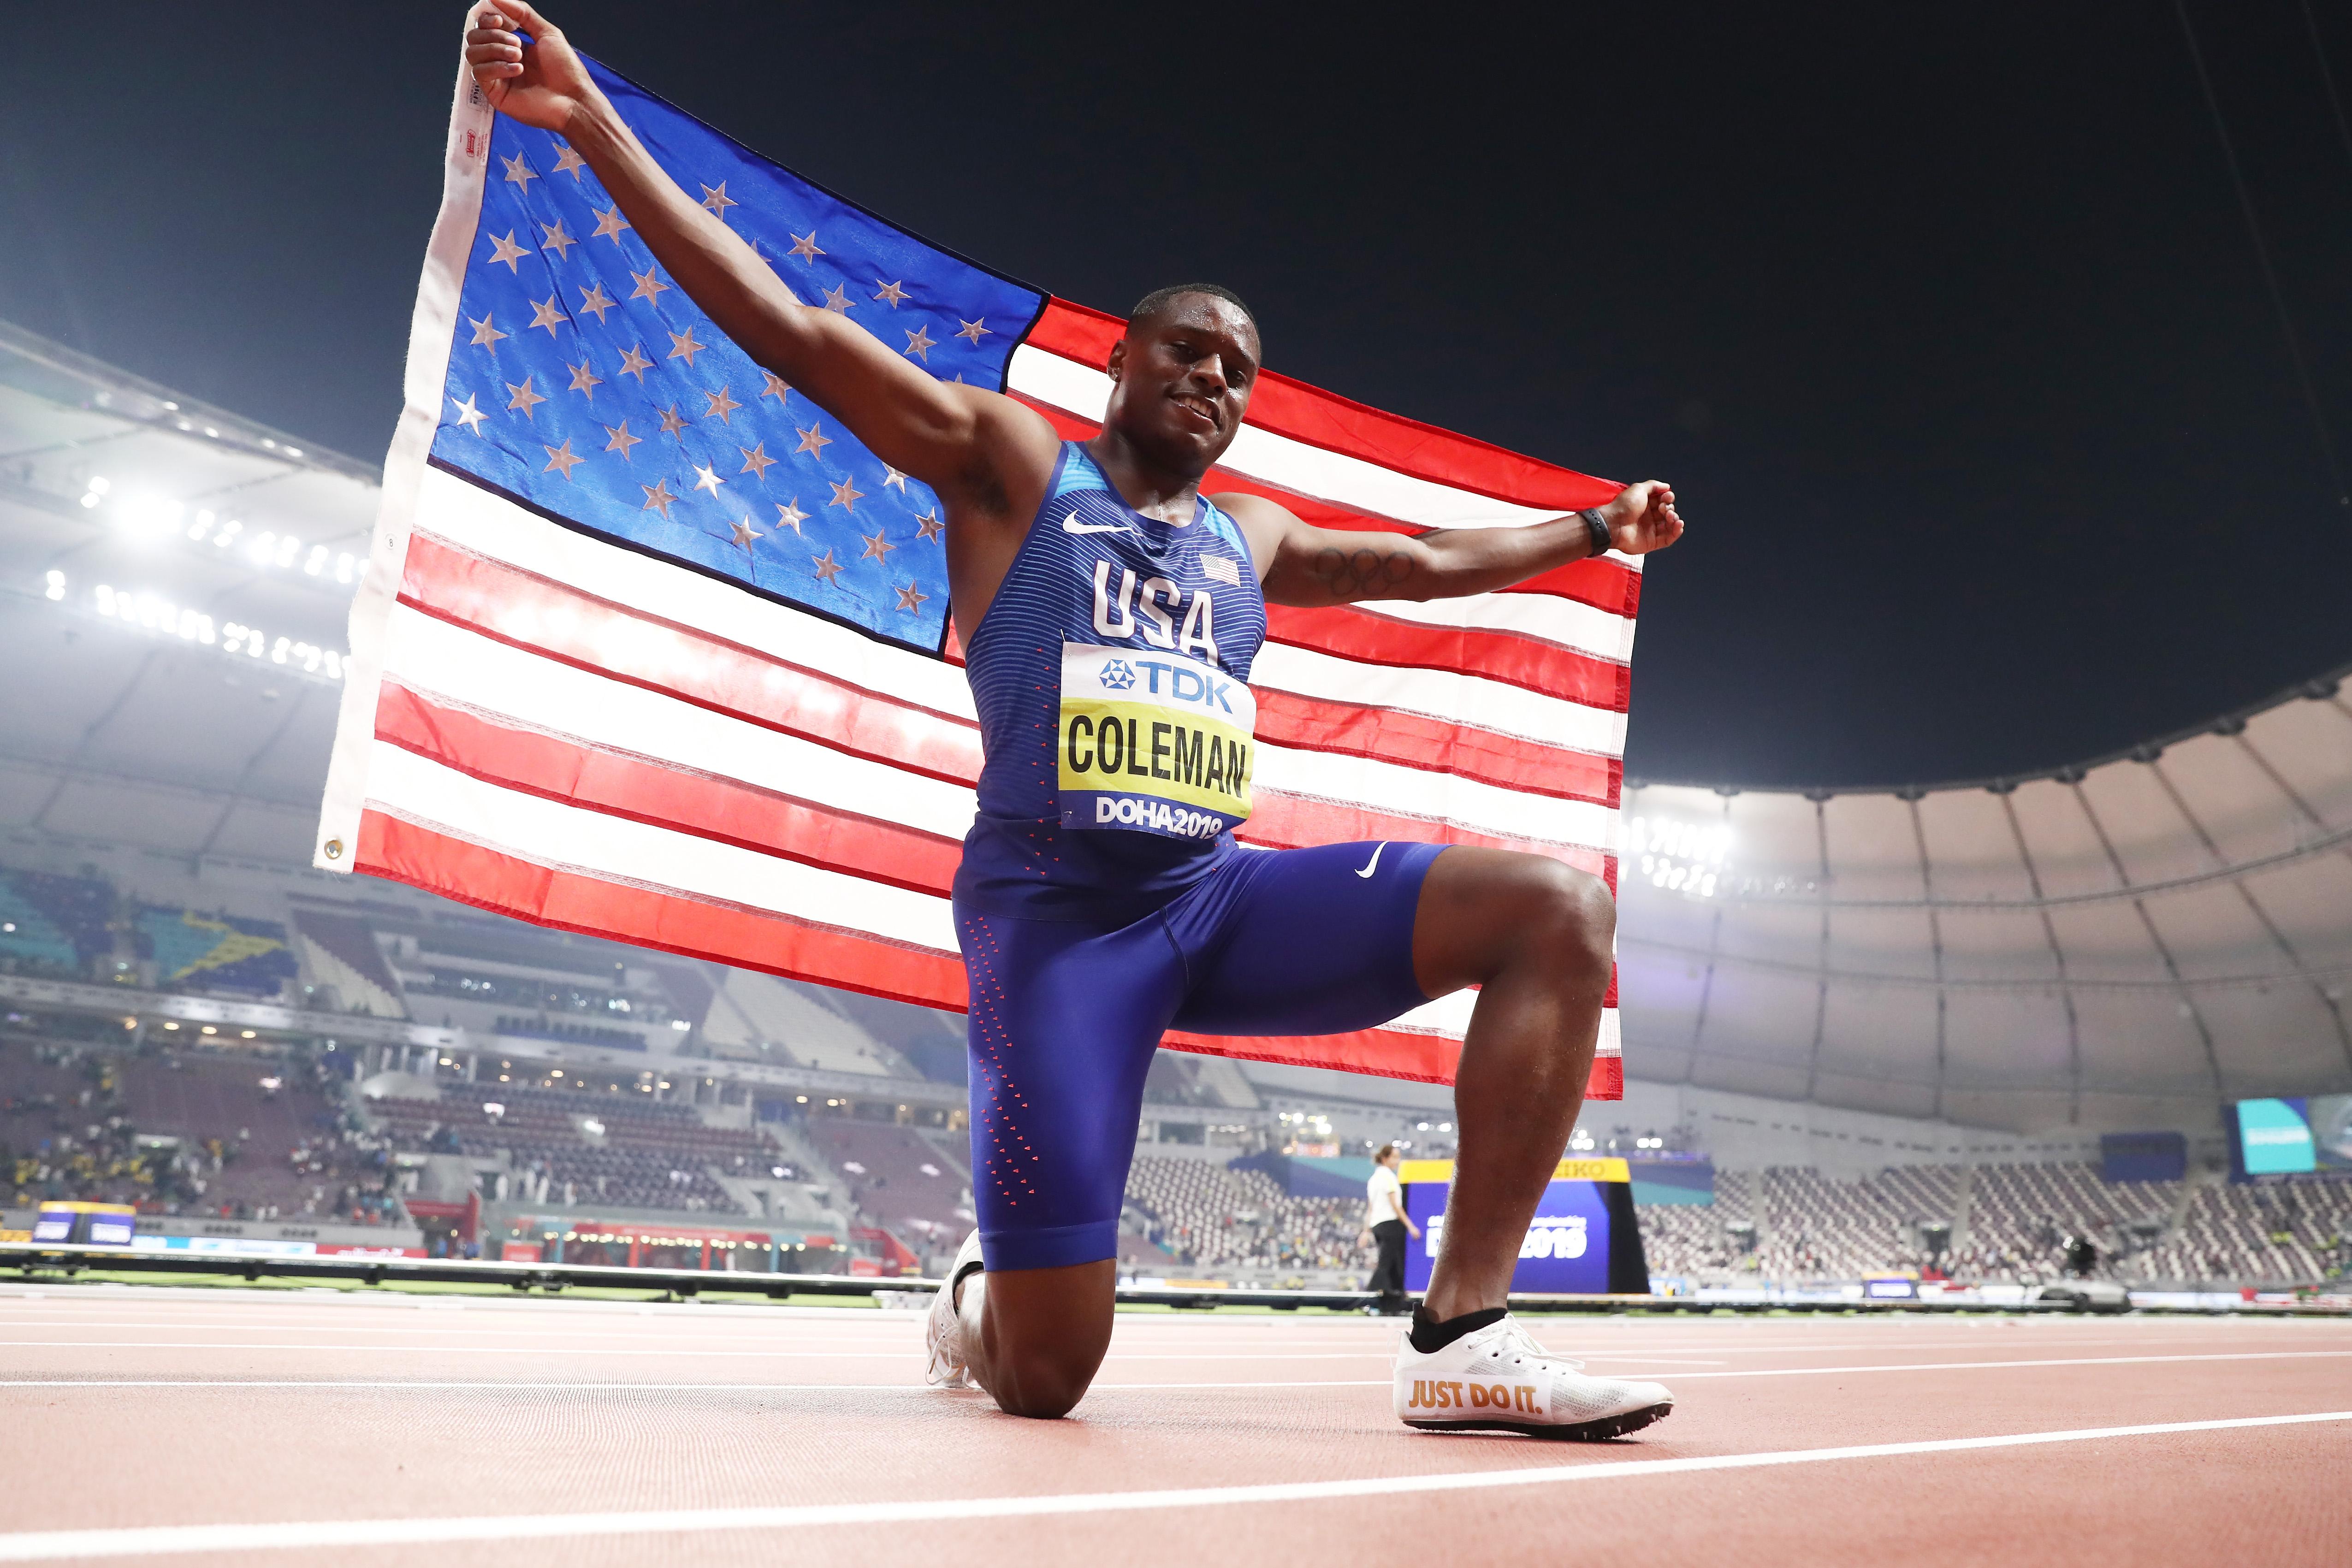 Christian Coleman wins the Doha 2019 World Athletics Championships 100m title